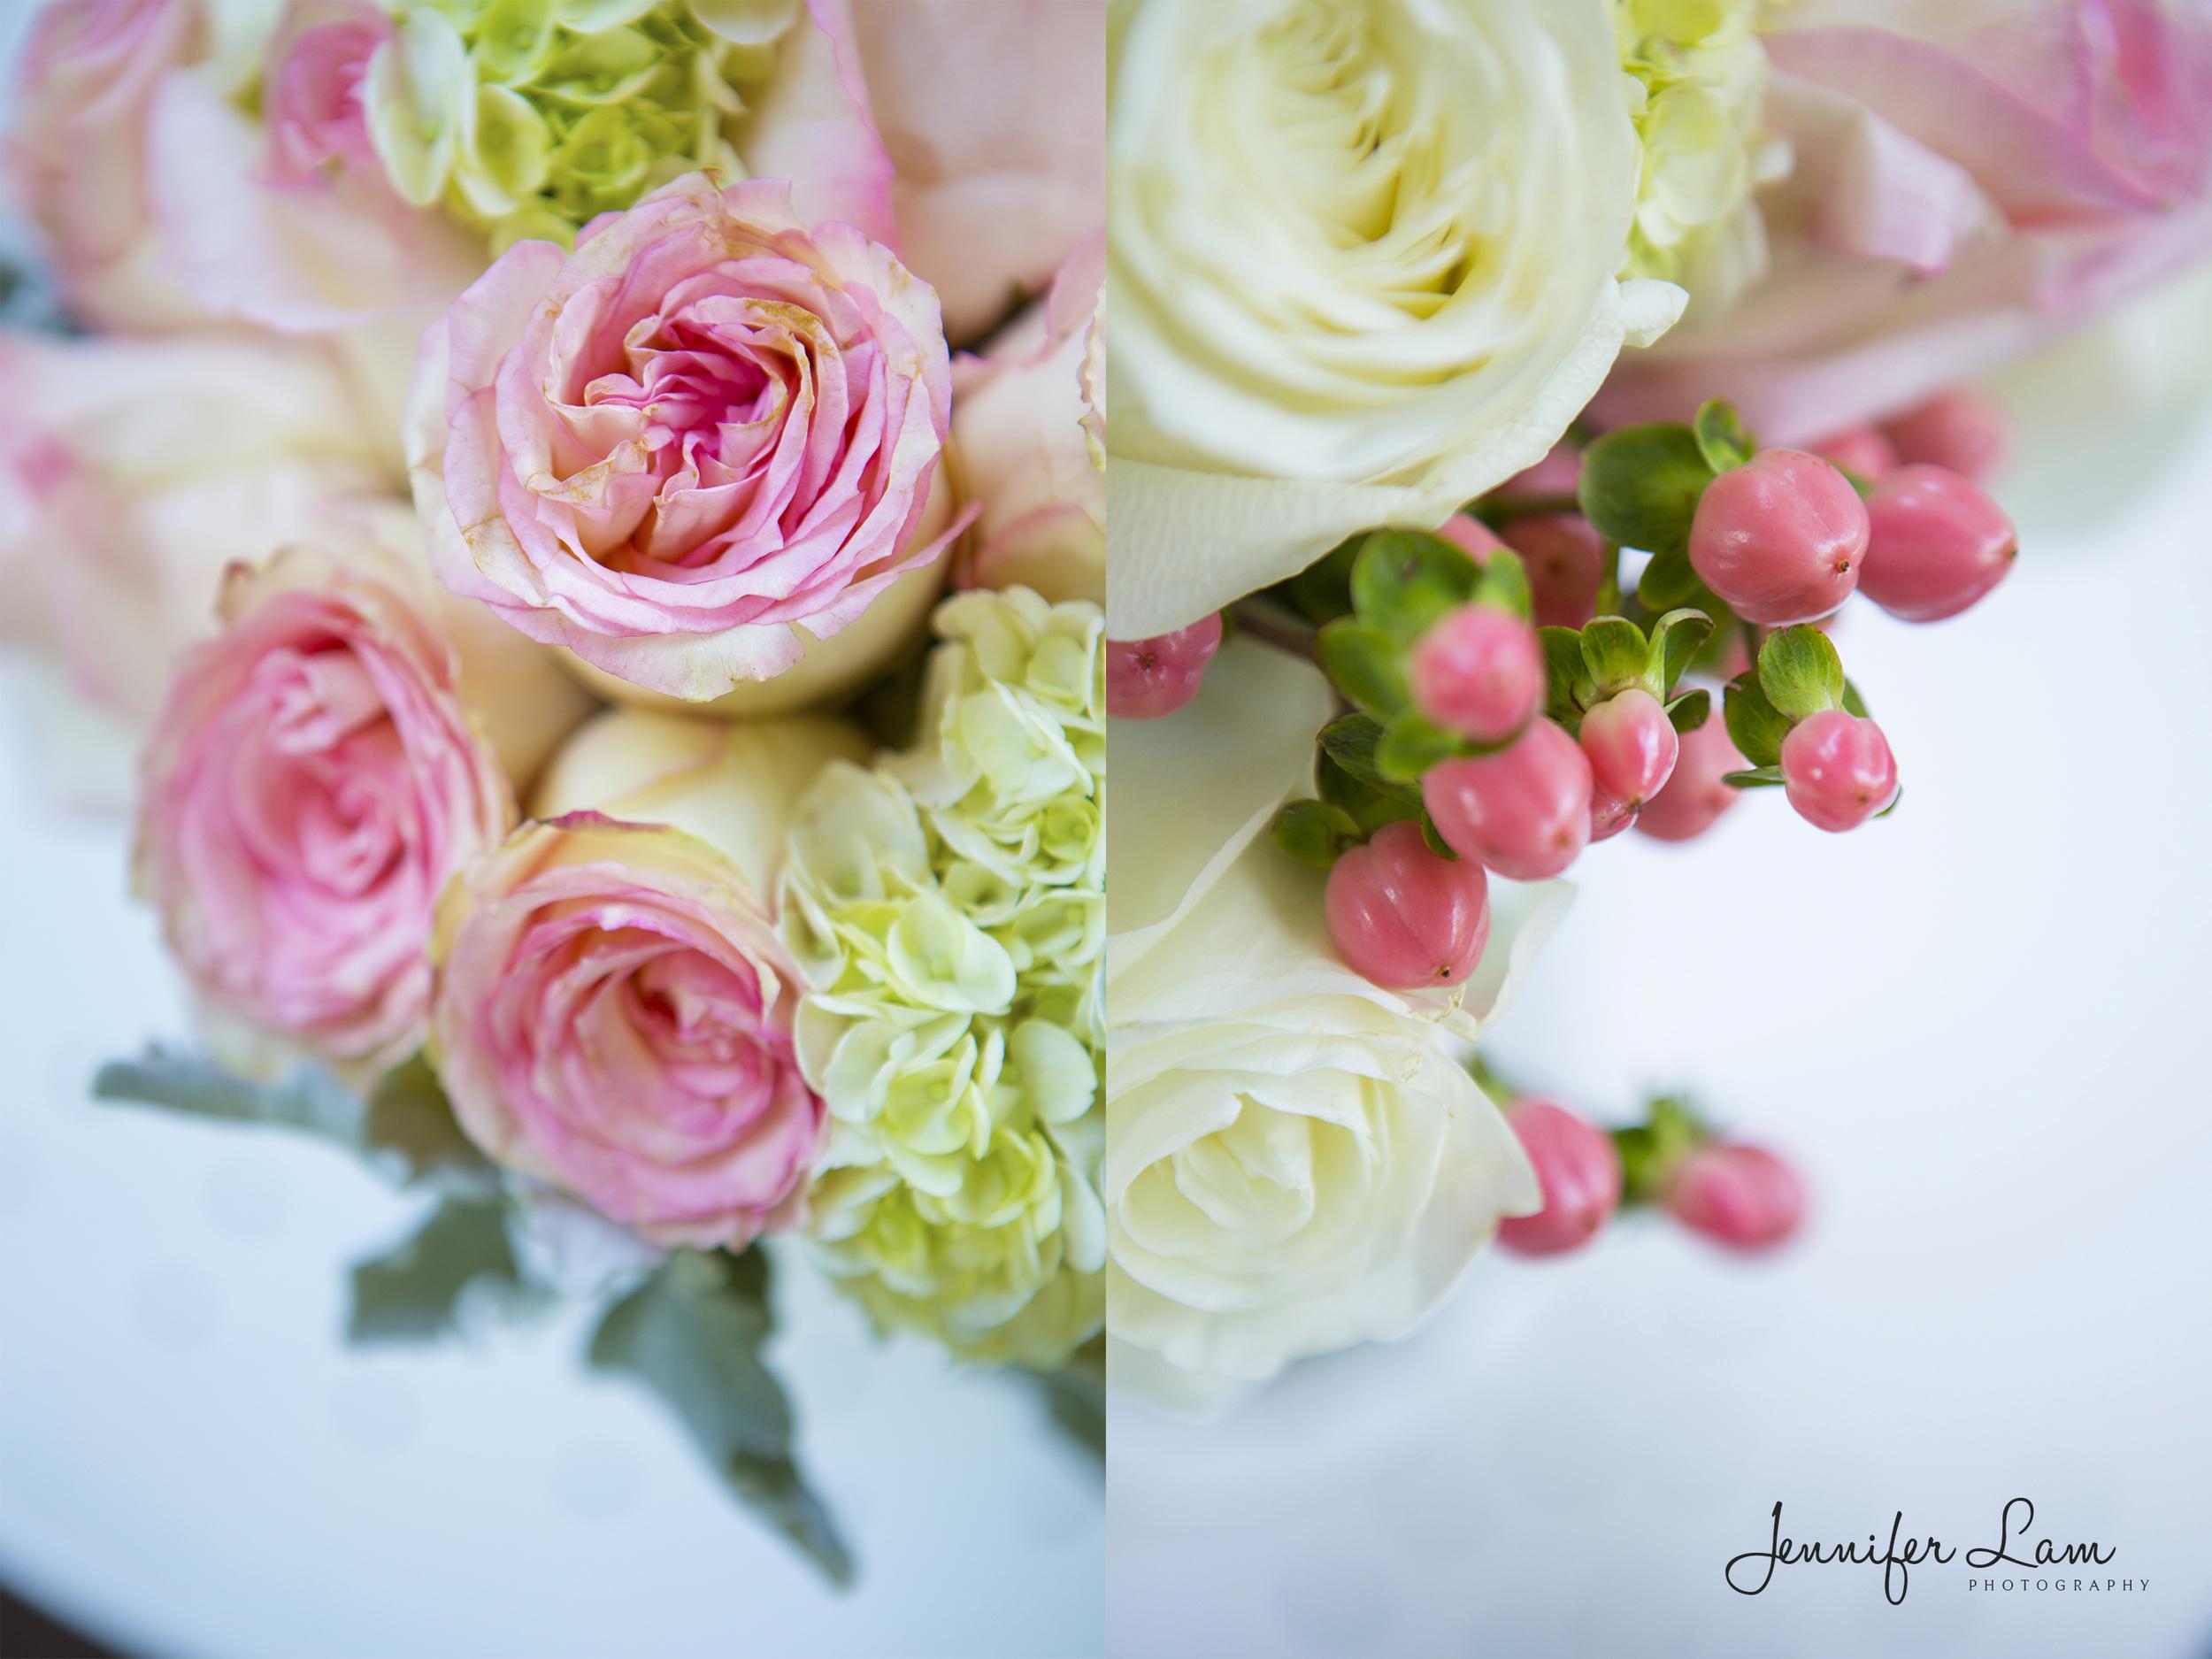 Sydney Wedding Photographer - Jennifer Lam Photography - www.jenniferlamphotography (50).jpg